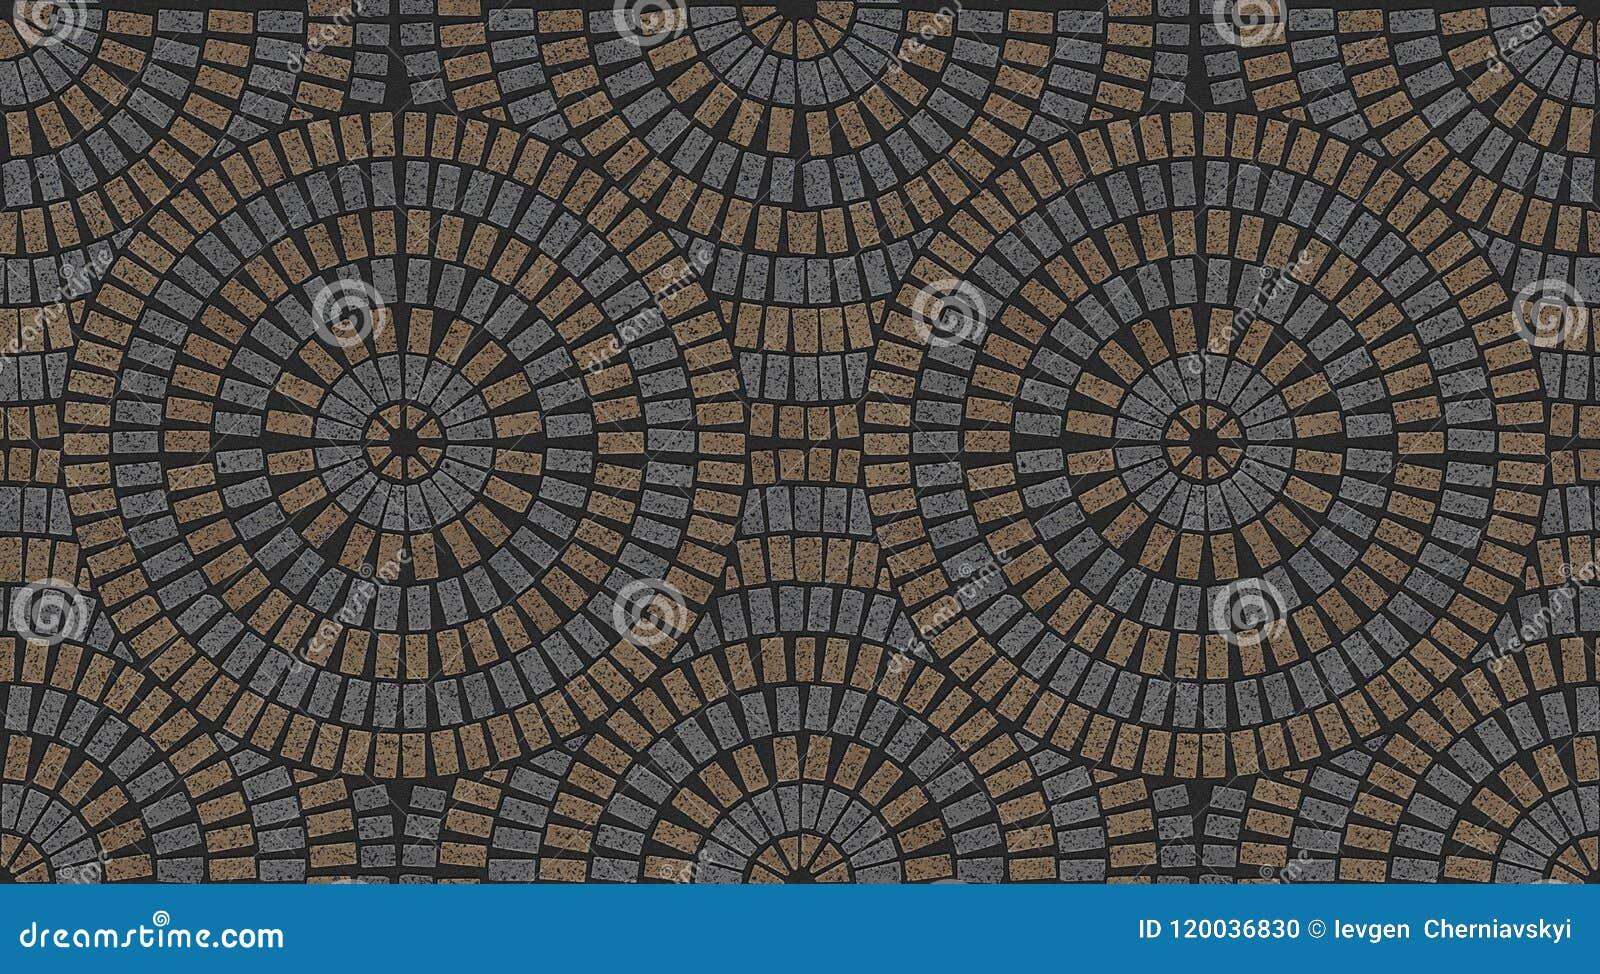 Granite Tile Paving Stones Seamless Texture Stock Illustration Illustration Of Ornate Granite 120036830